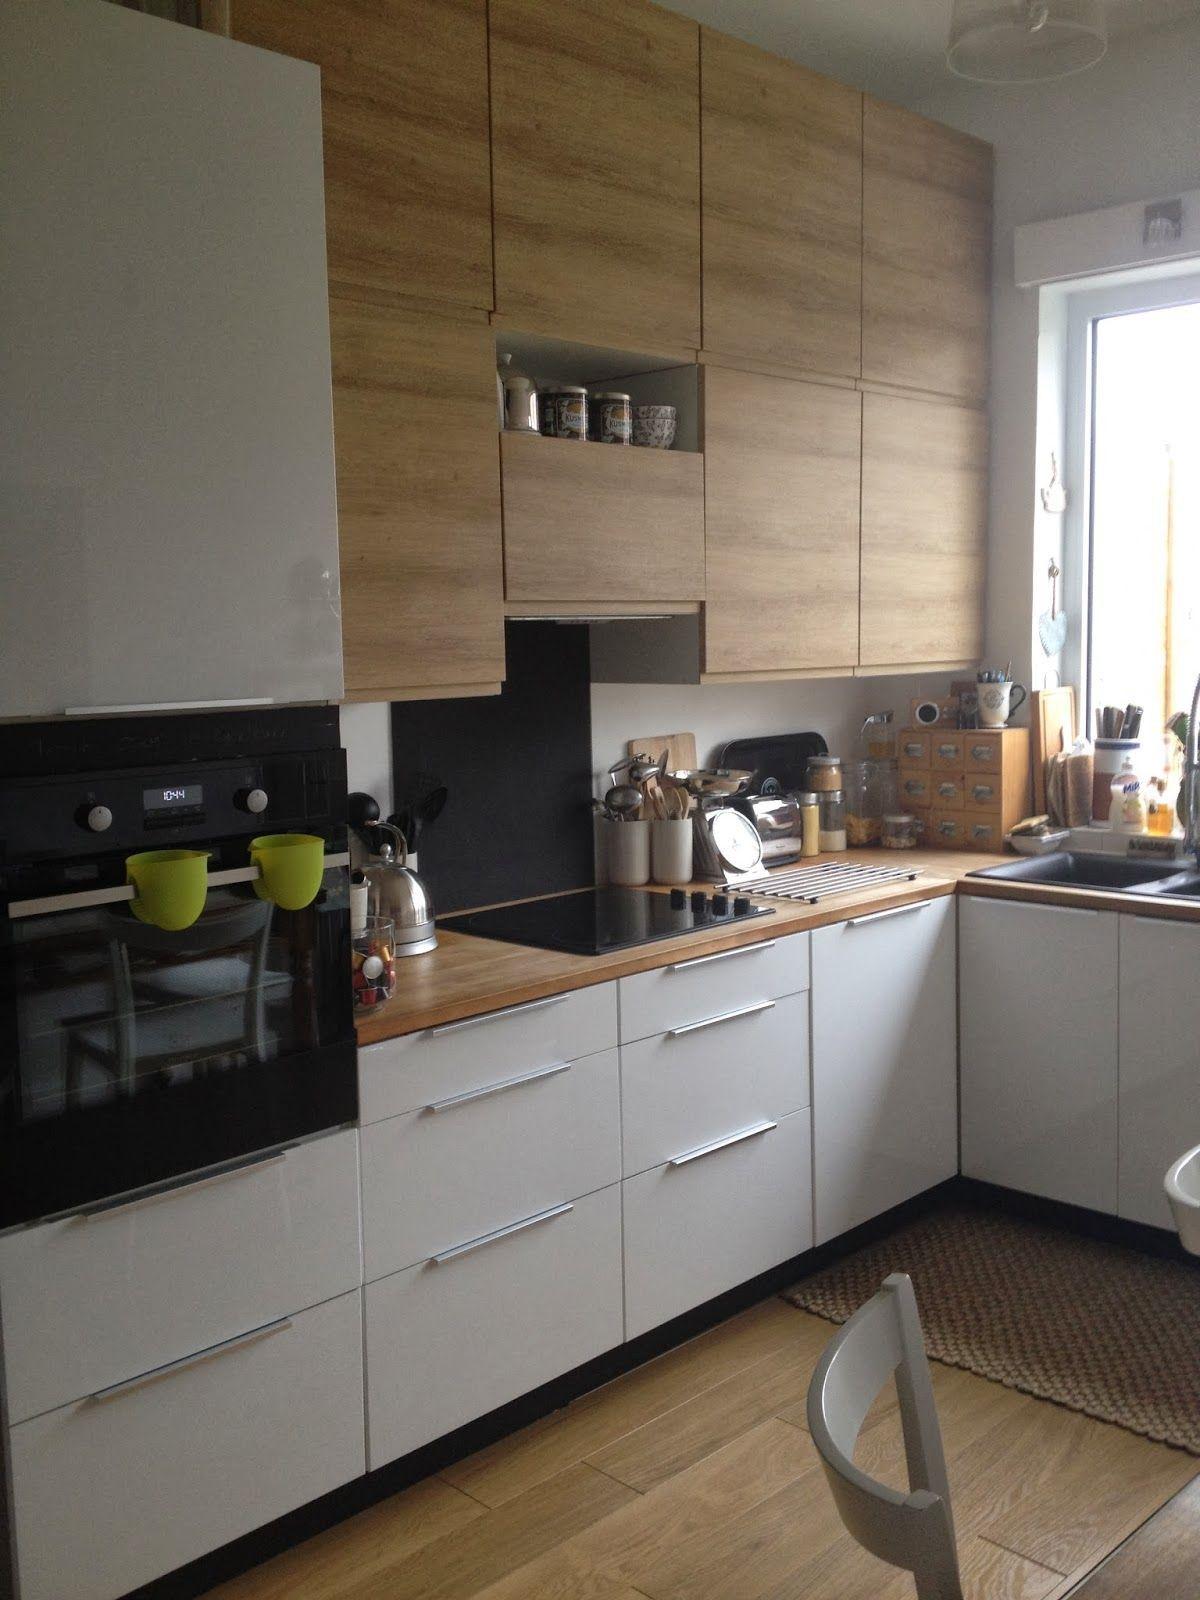 Fresh Ma Cuisine Leroy Merlin Interior Design Kitchen Kitchen Remodel Small Kitchen Remodel